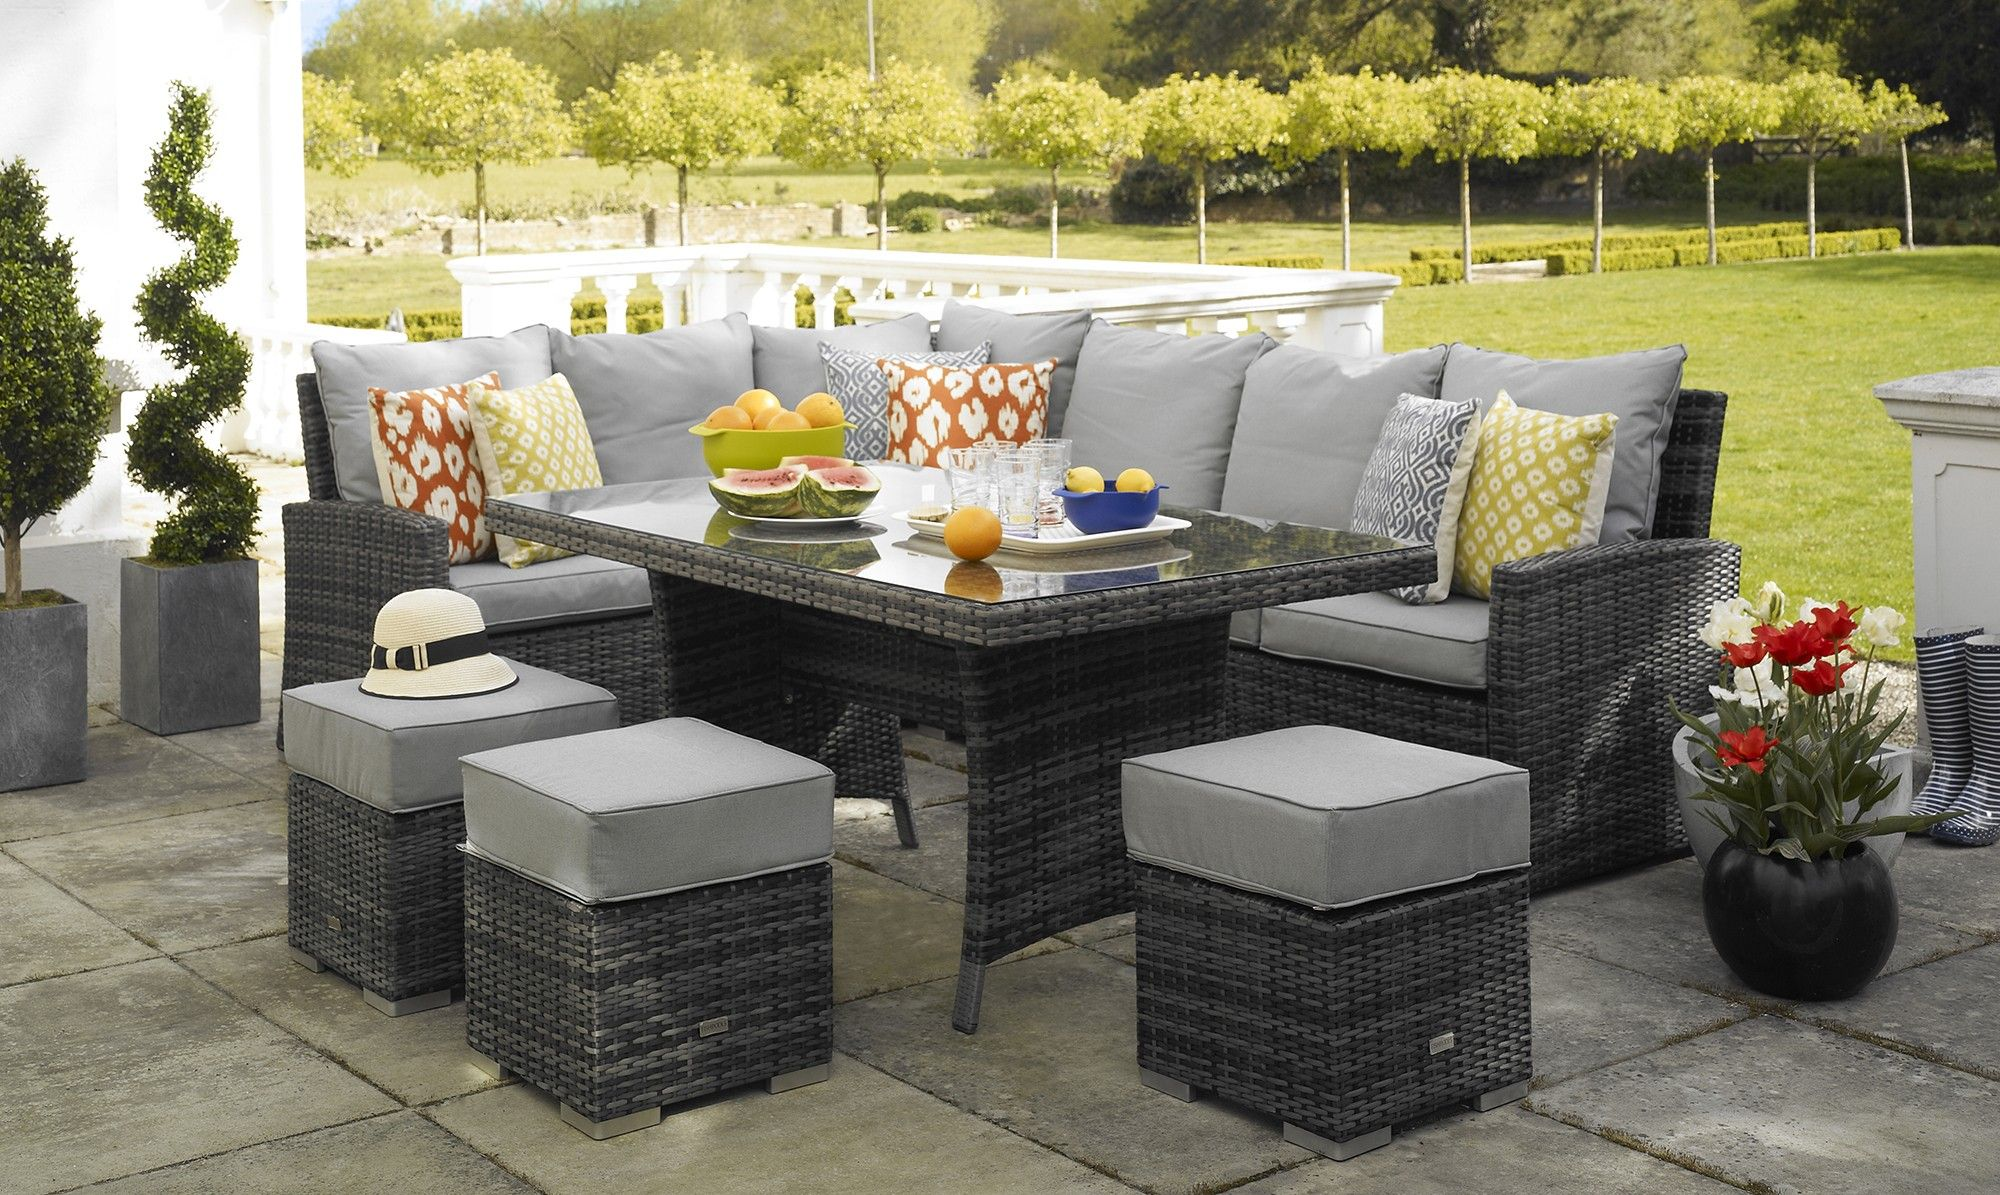 garden corner sofa with dining table karlstad green mauritius grey rattan set all furniture fishpools